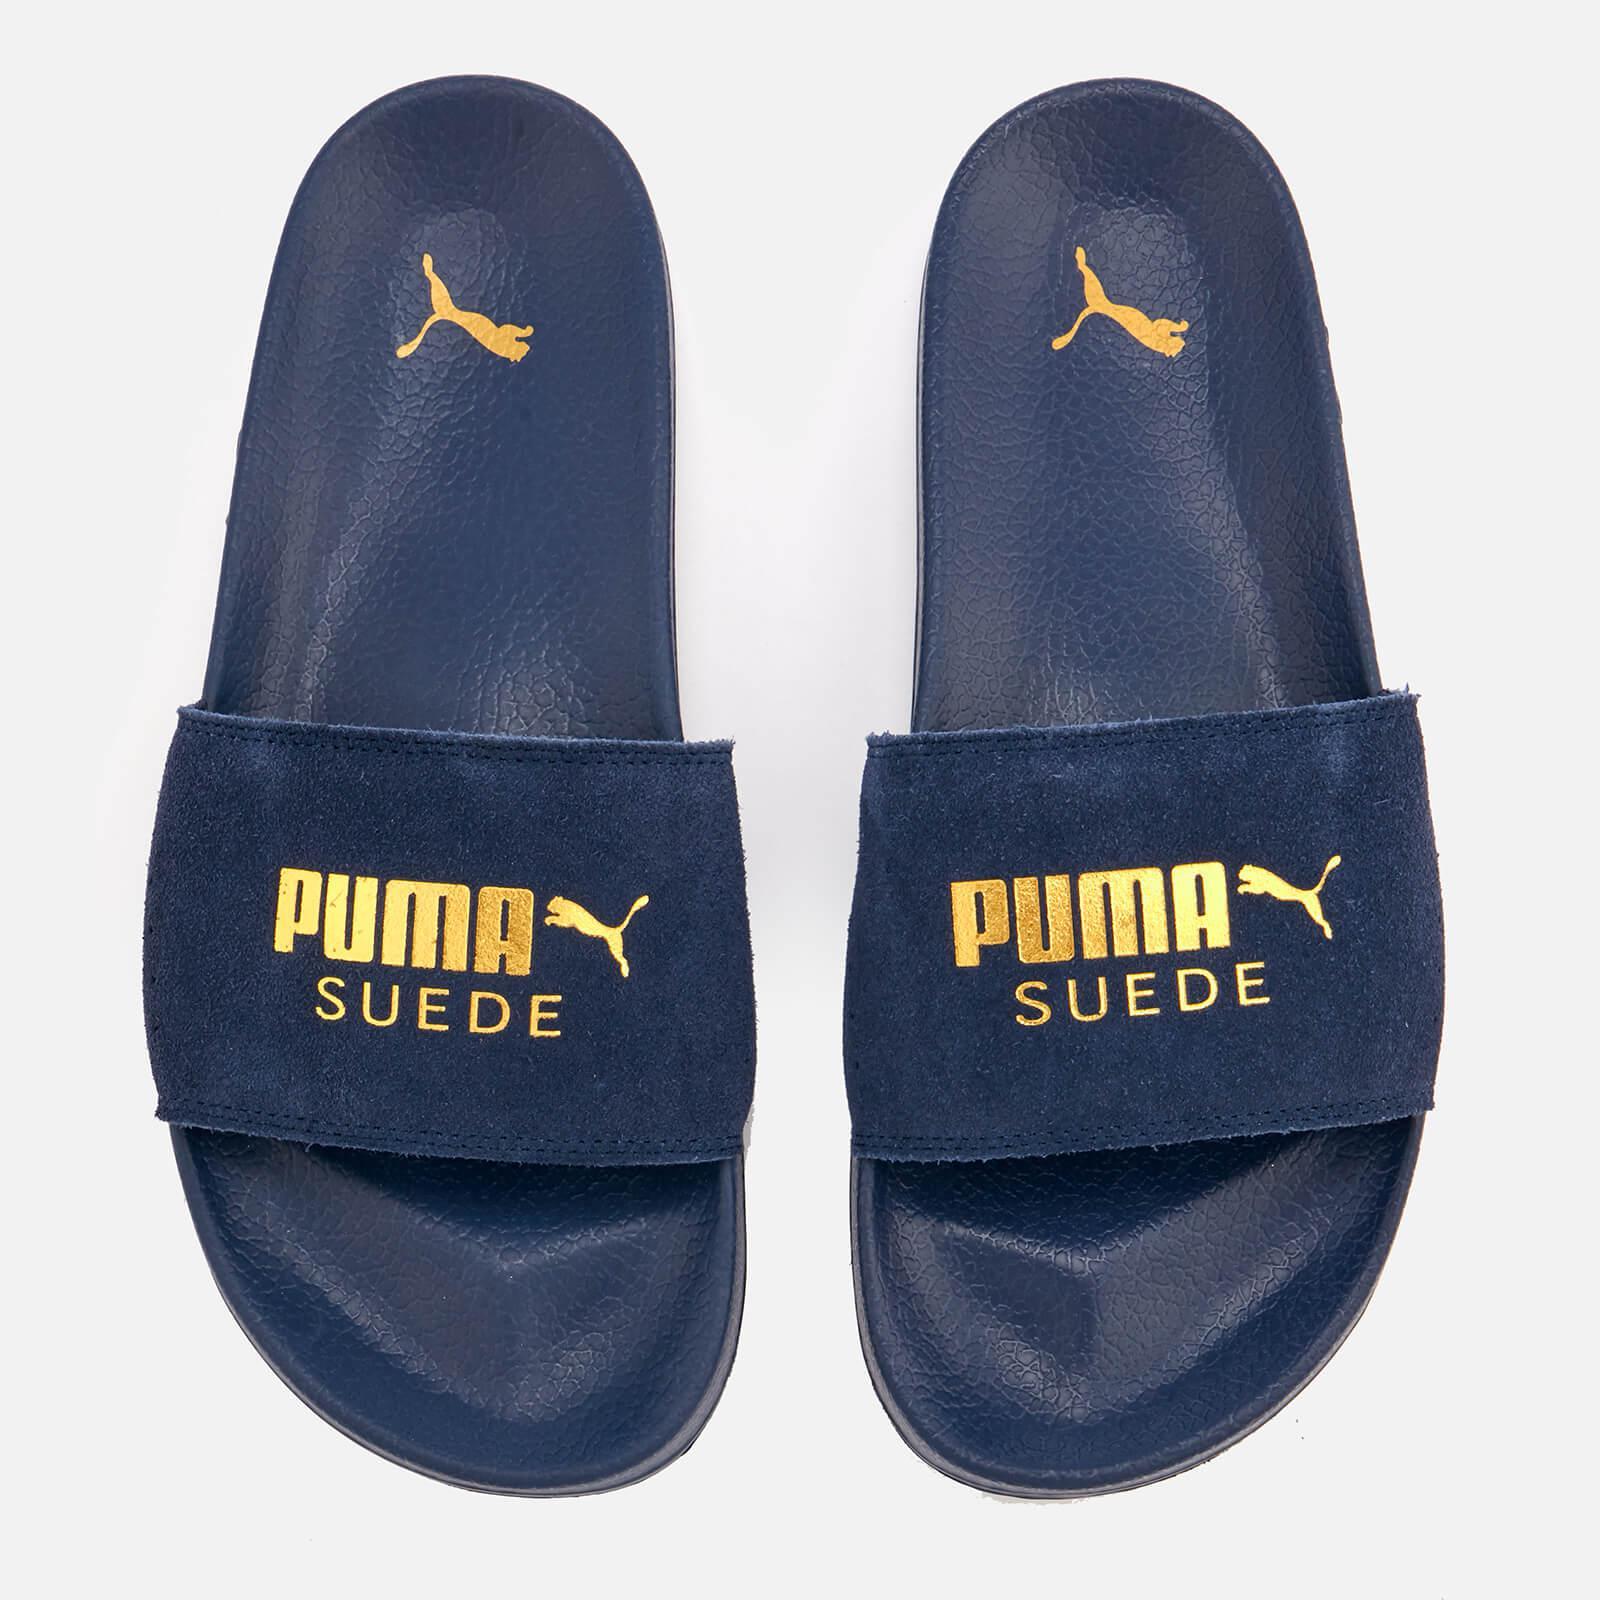 PUMA Leadcat Suede Slide Sandal in Black for Men - Lyst